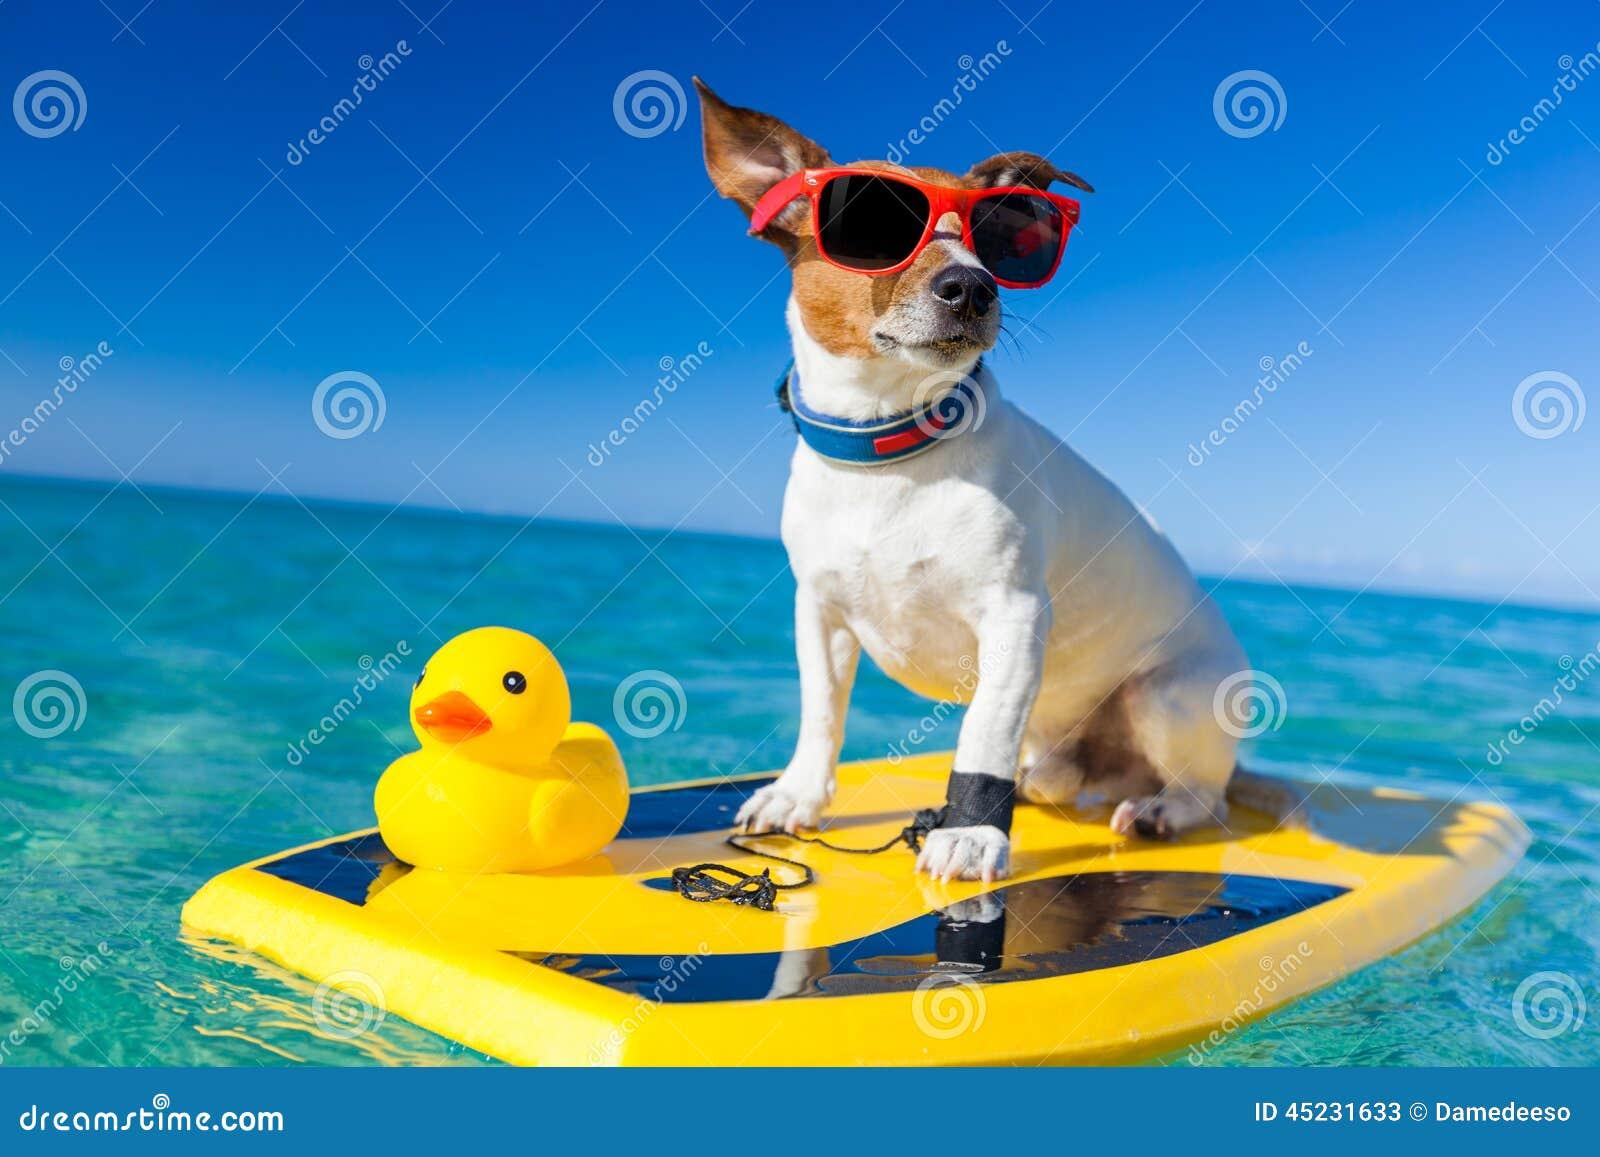 Surfing Dog Stock Image Image Of Isolated Power Shades